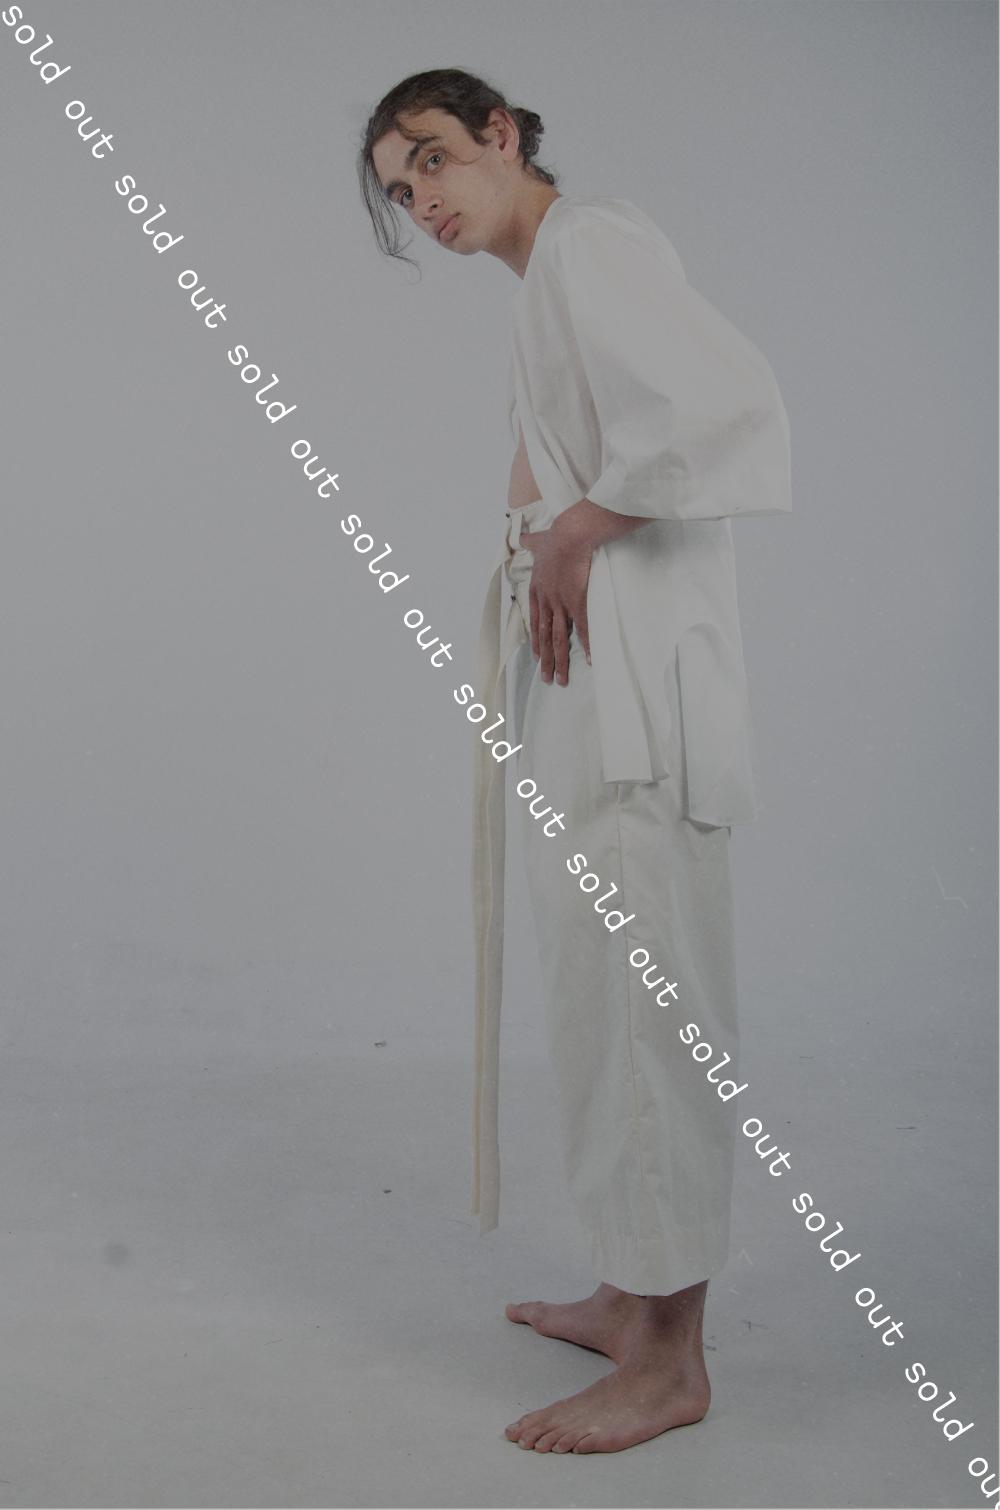 joseph-hollebon-double-waistband-trousers-agoraphobia-collective